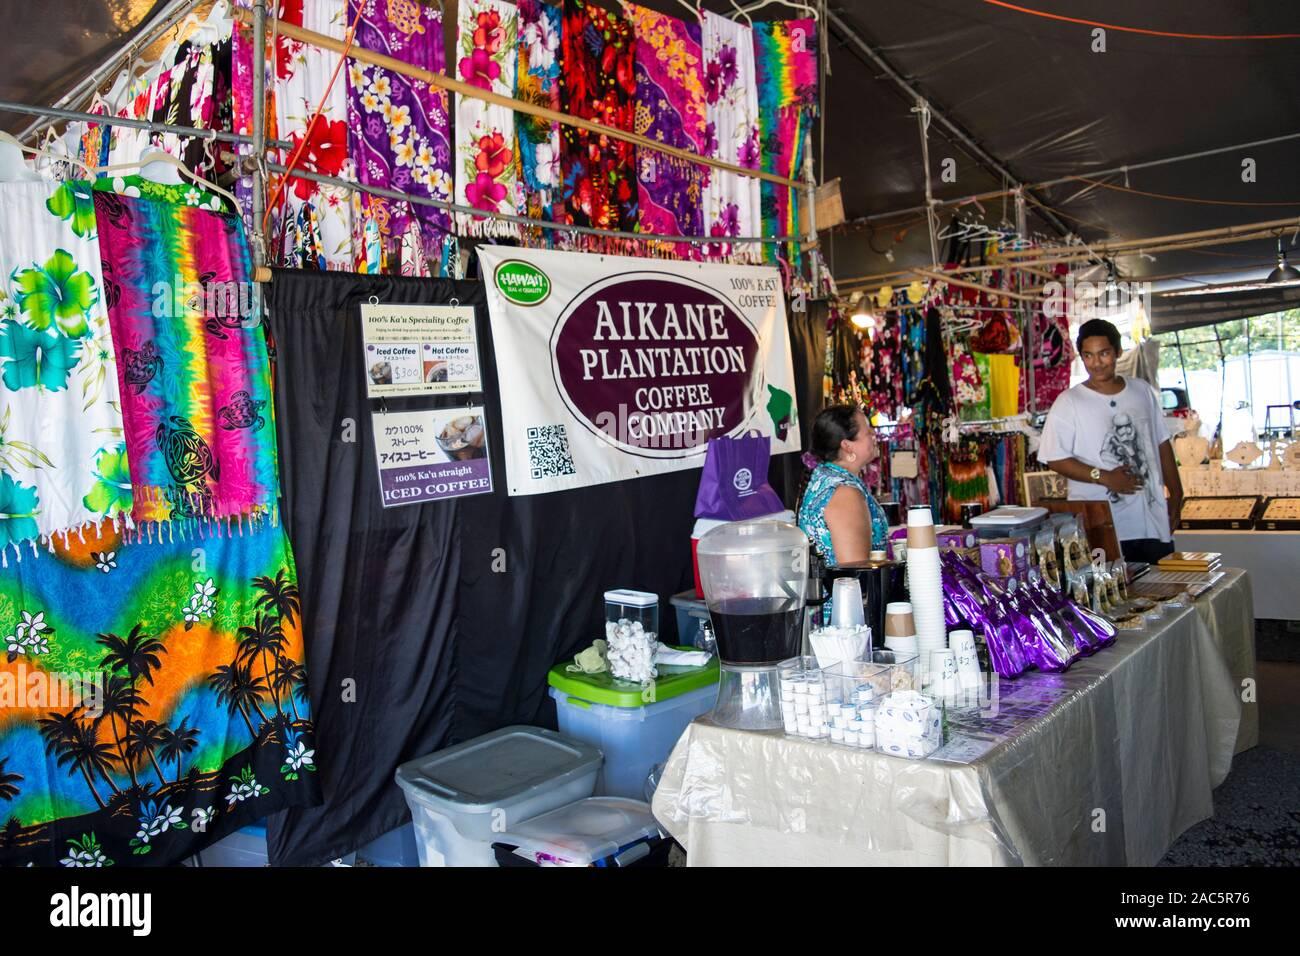 The Aikane Plantation Coffee Company booth at the Hilo Farmers Market, Big Island of Hawai'i. Stock Photo